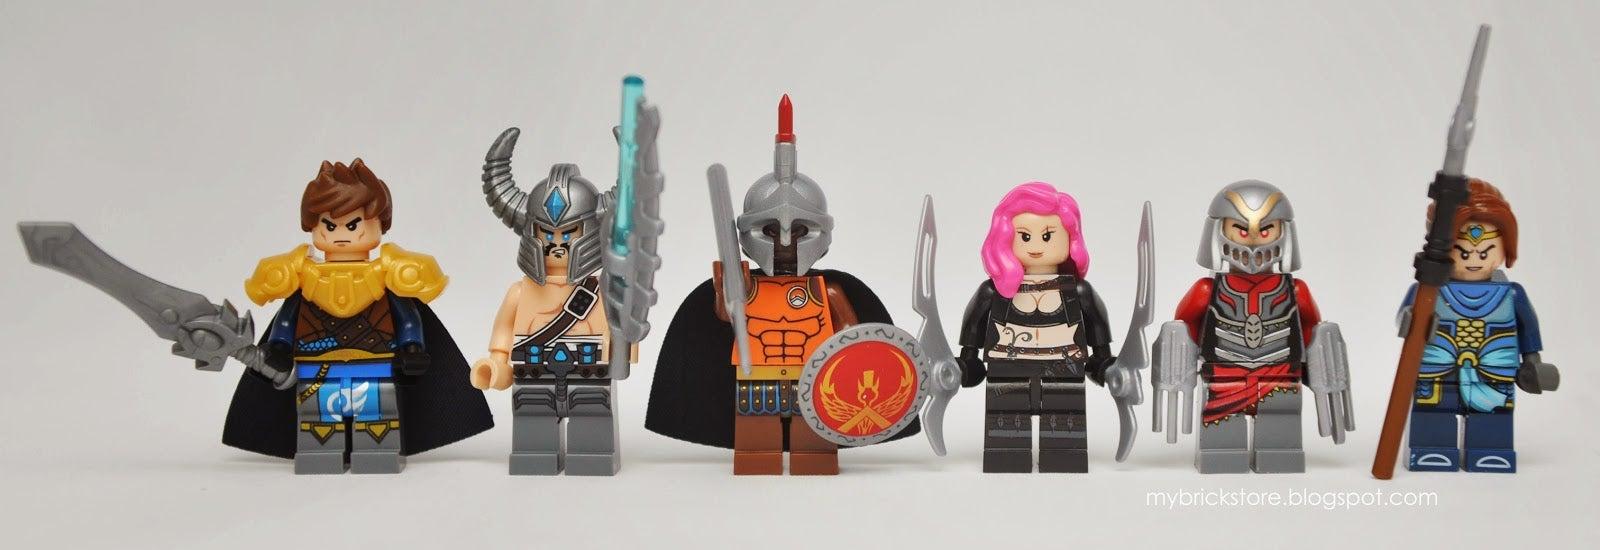 Fake League of Legends LEGO Looks Awesome